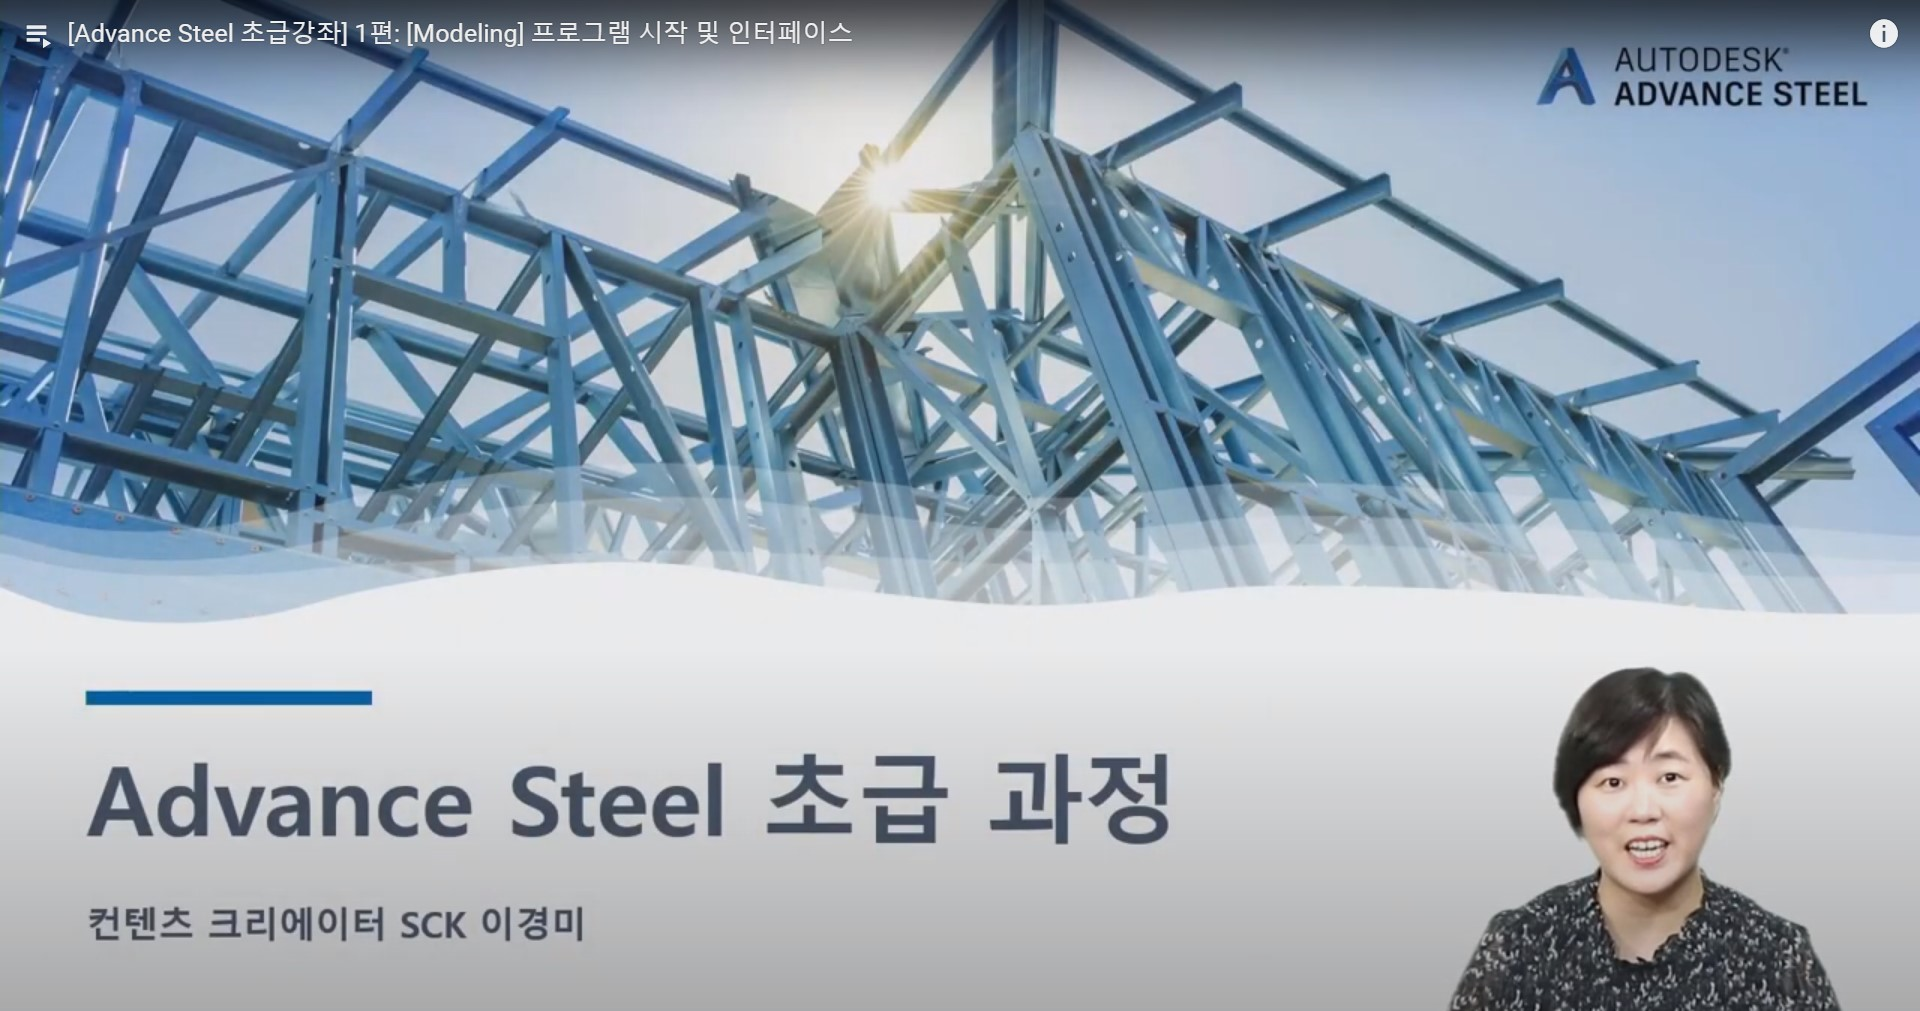 Autodesk Advanced steel 썸네일